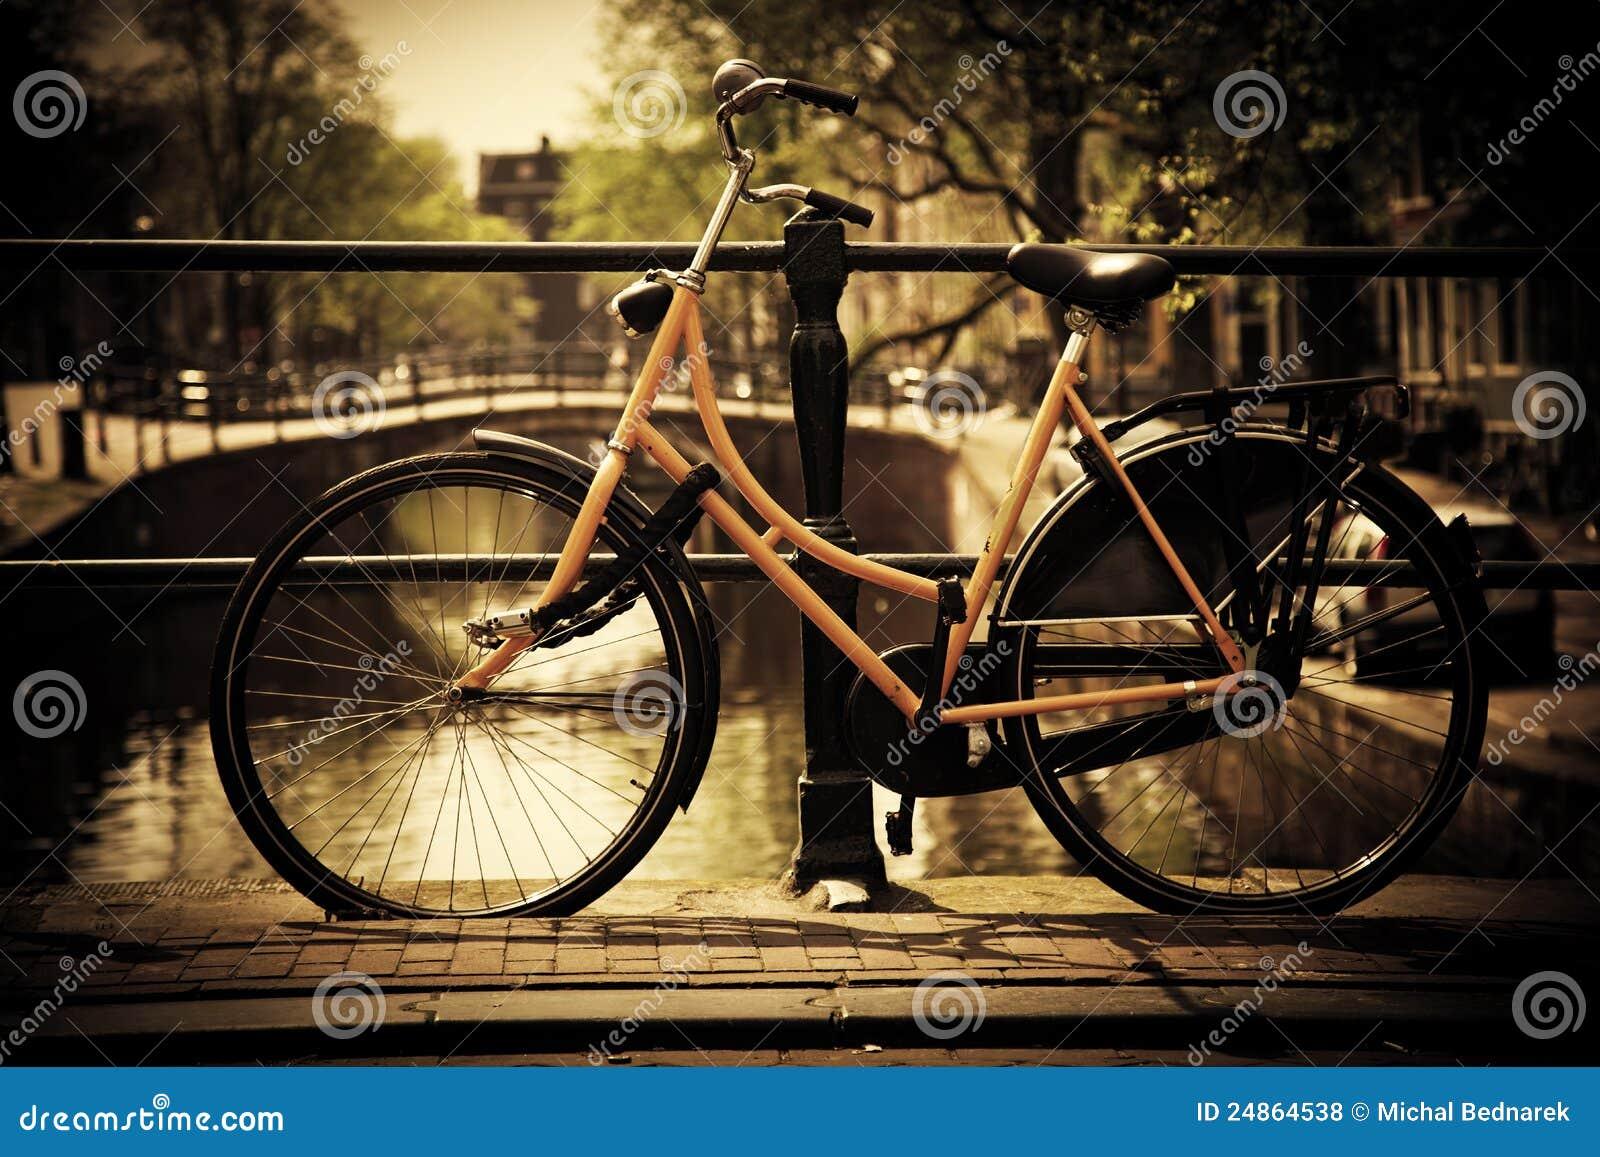 Amsterdam. Romantisch kanaal, fiets